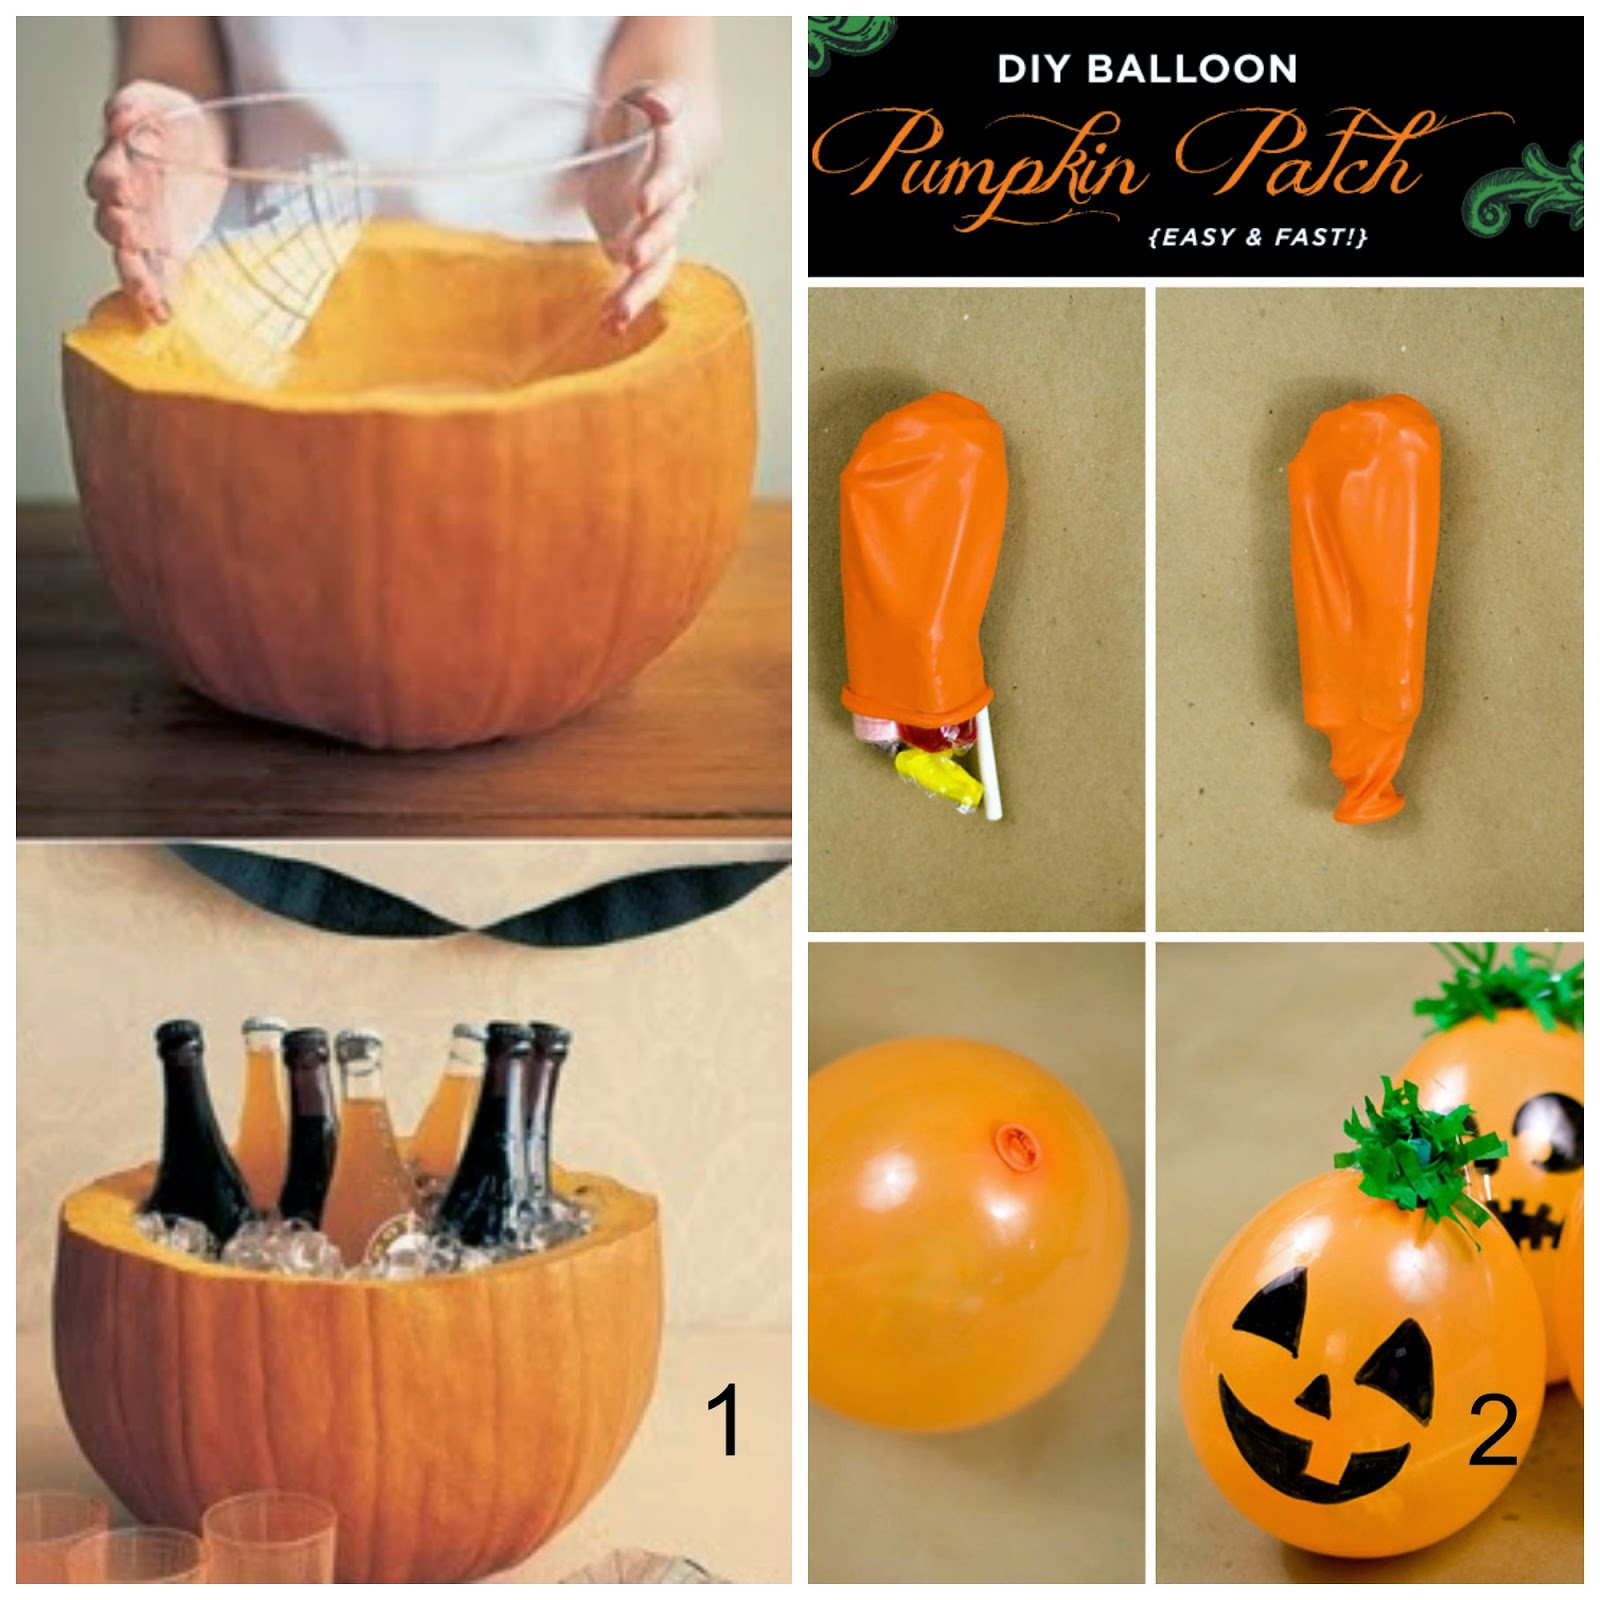 Souvent Mamma Aiuta Mamma: Addobbi fai da te per Halloween TE18